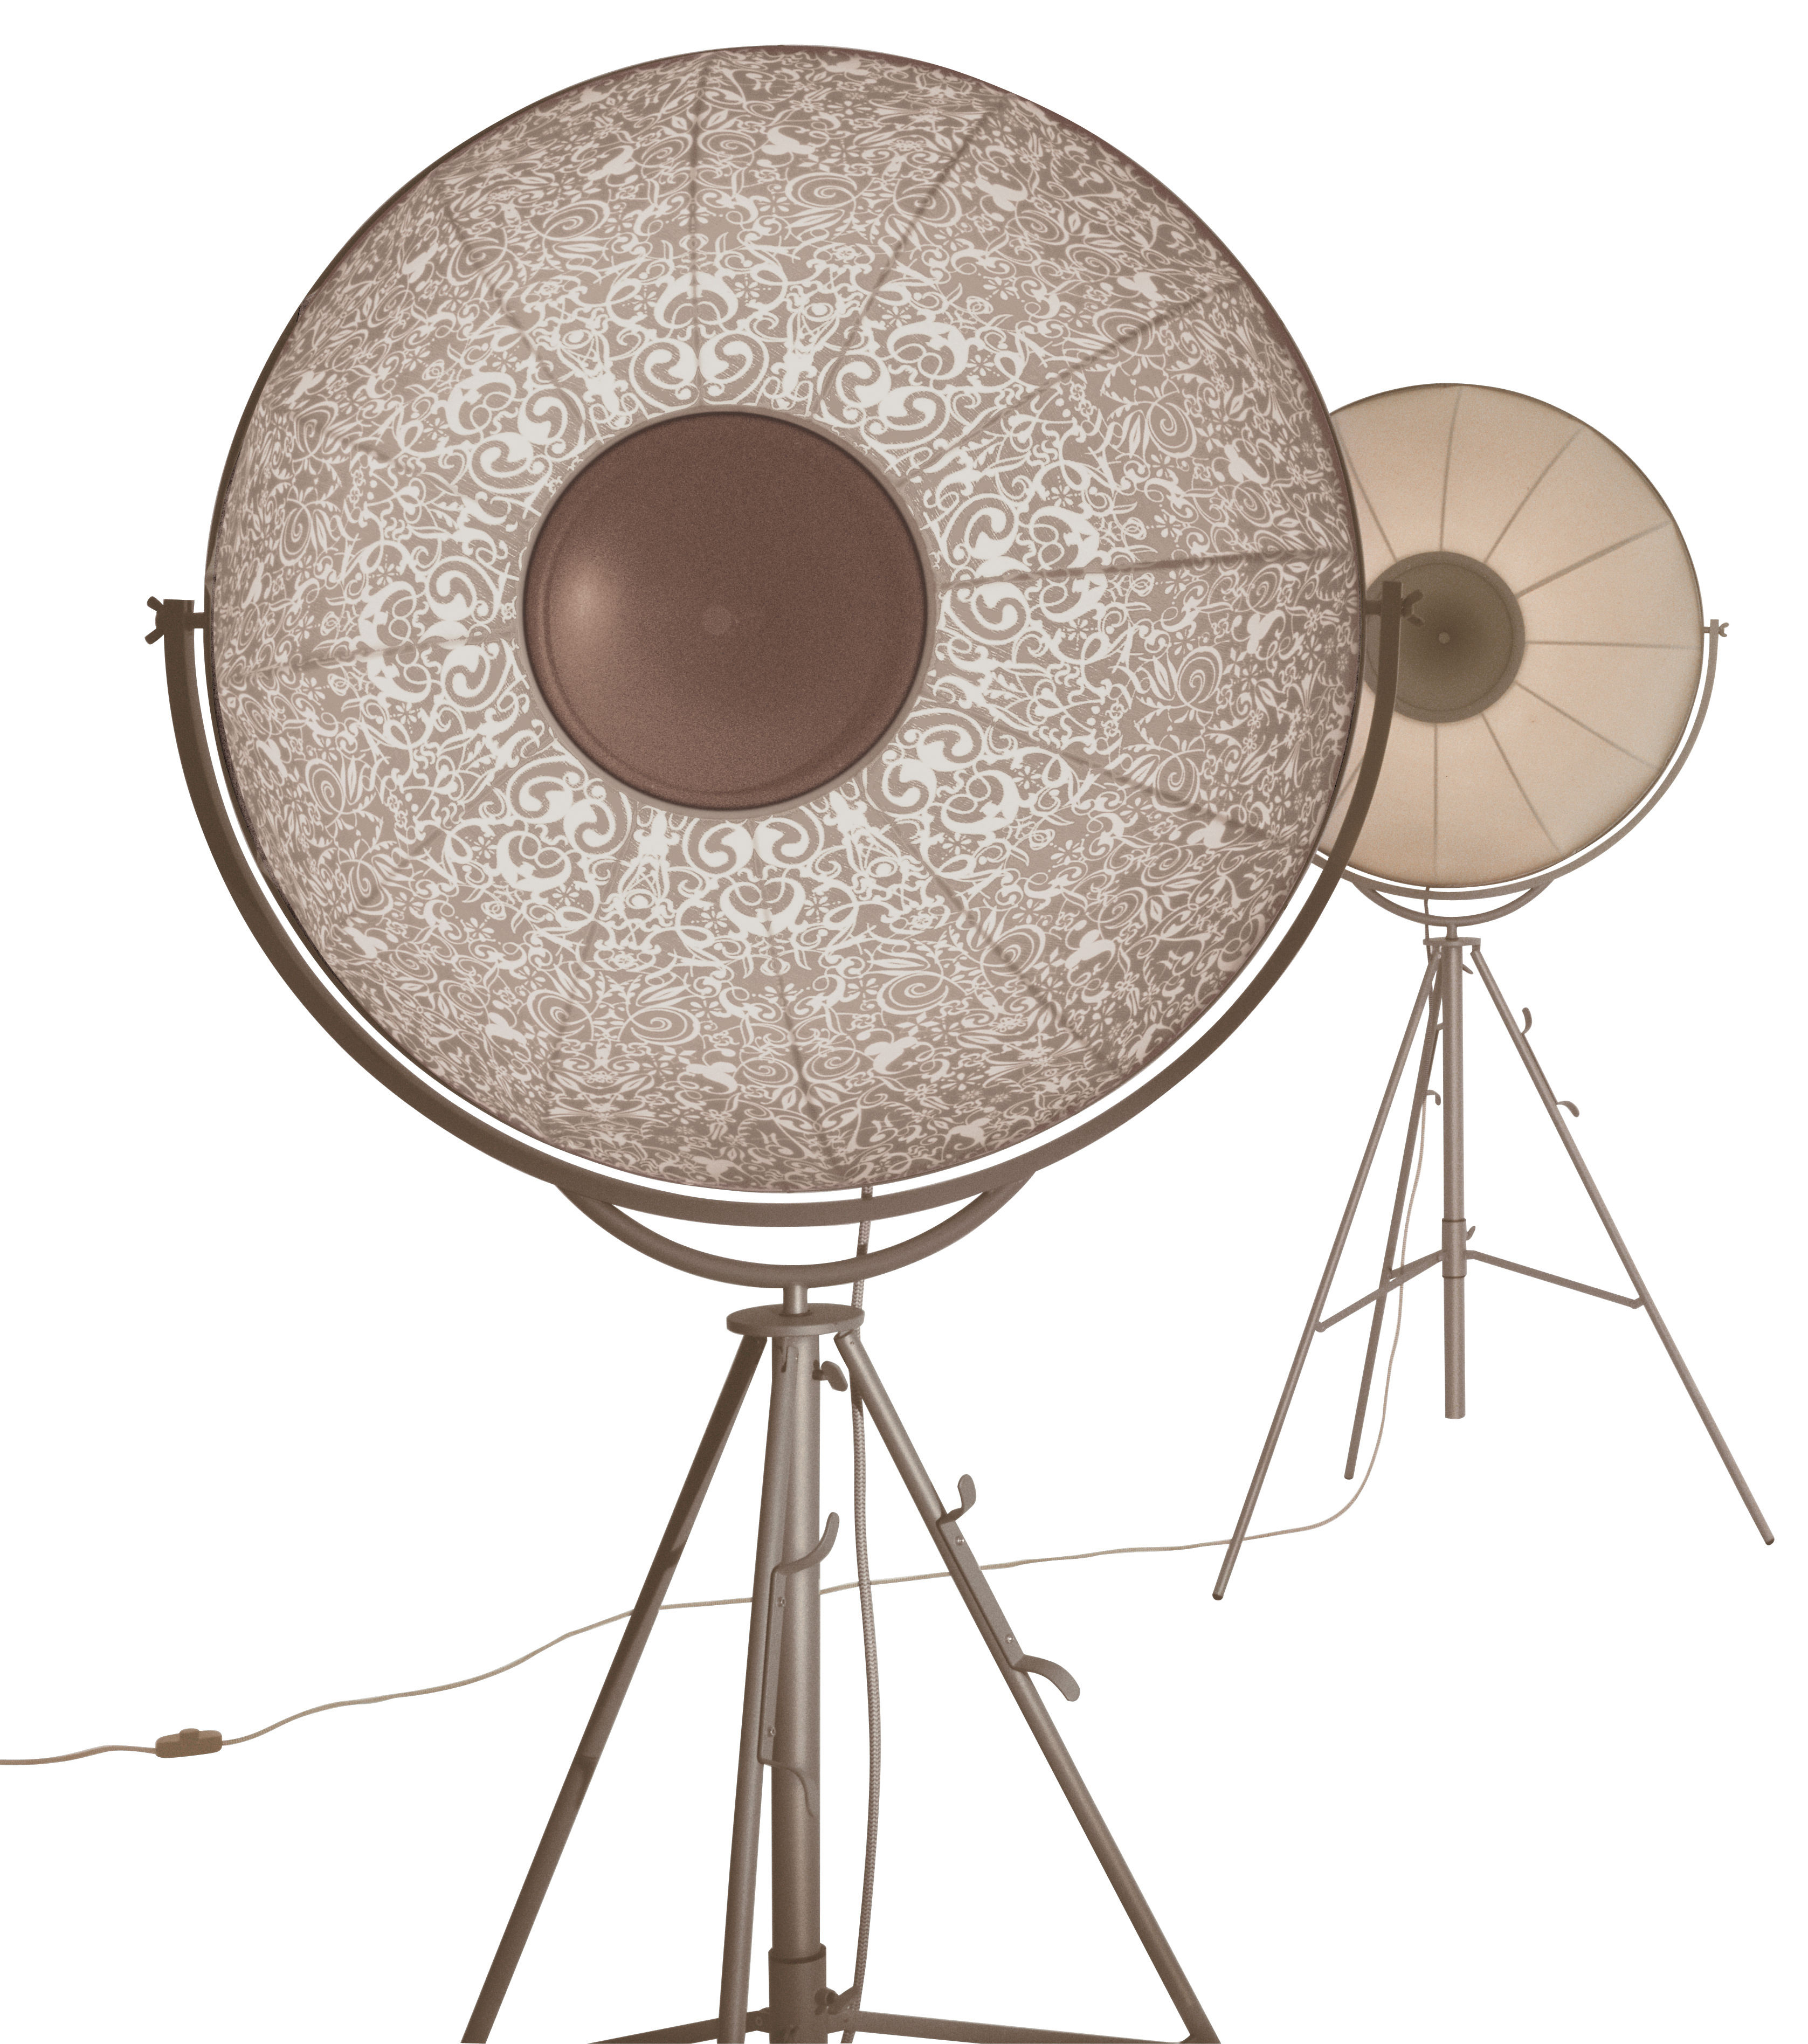 Fortuny Atelier 63 Floor Lamp White: Fortuny Ornaments Floor Lamp White Patterns On Beige Back